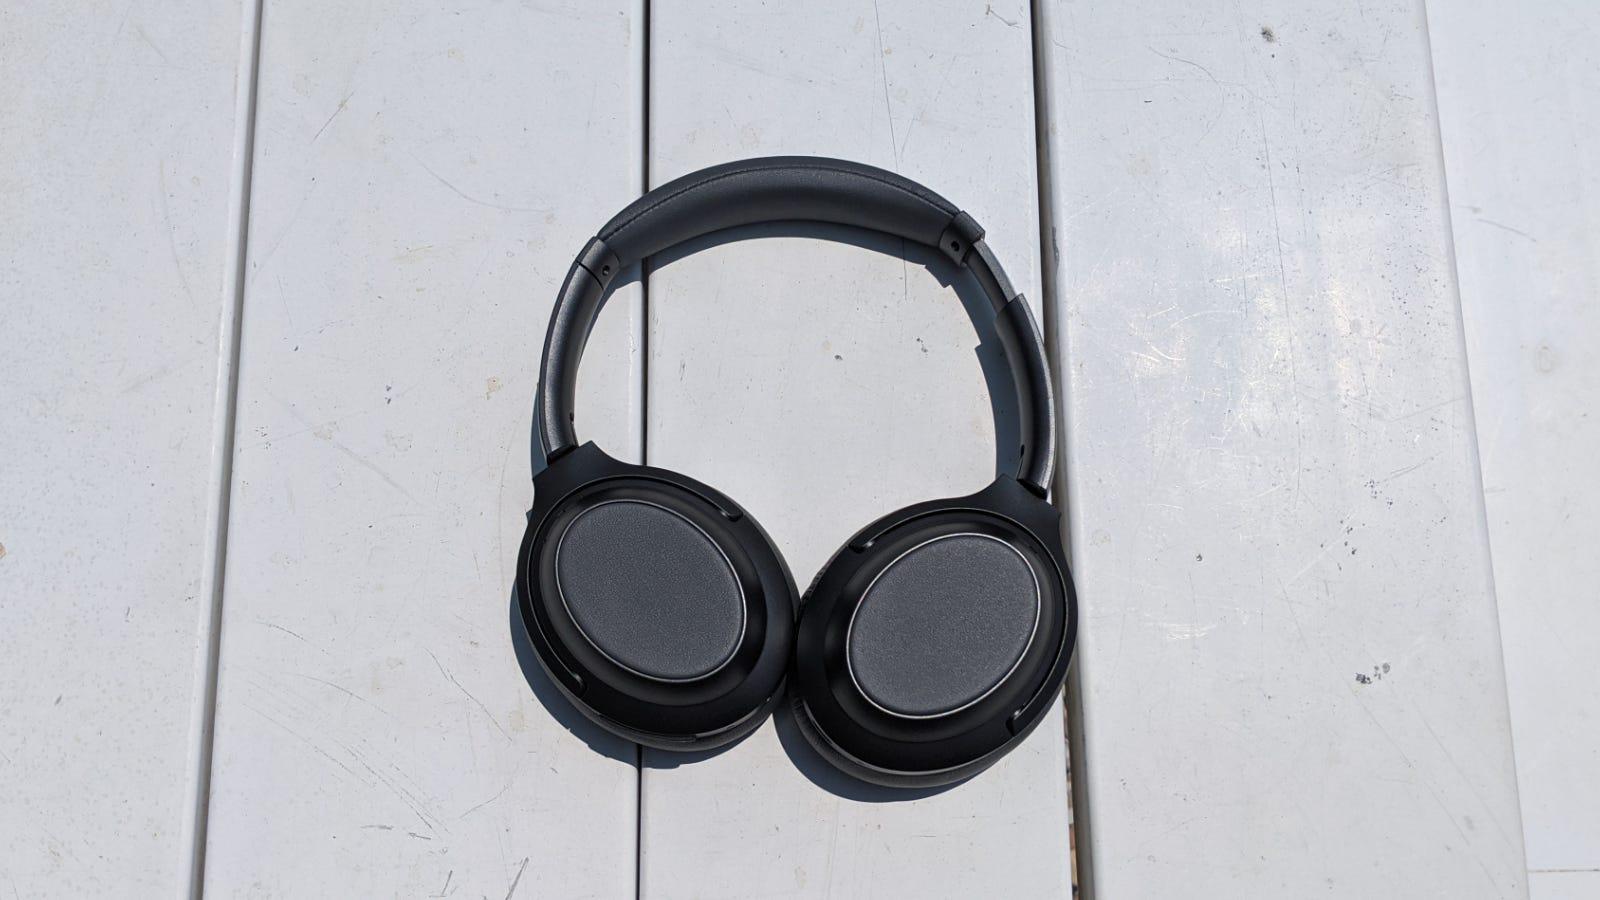 Monoprice BT-600ANC headphones on a white picnic table